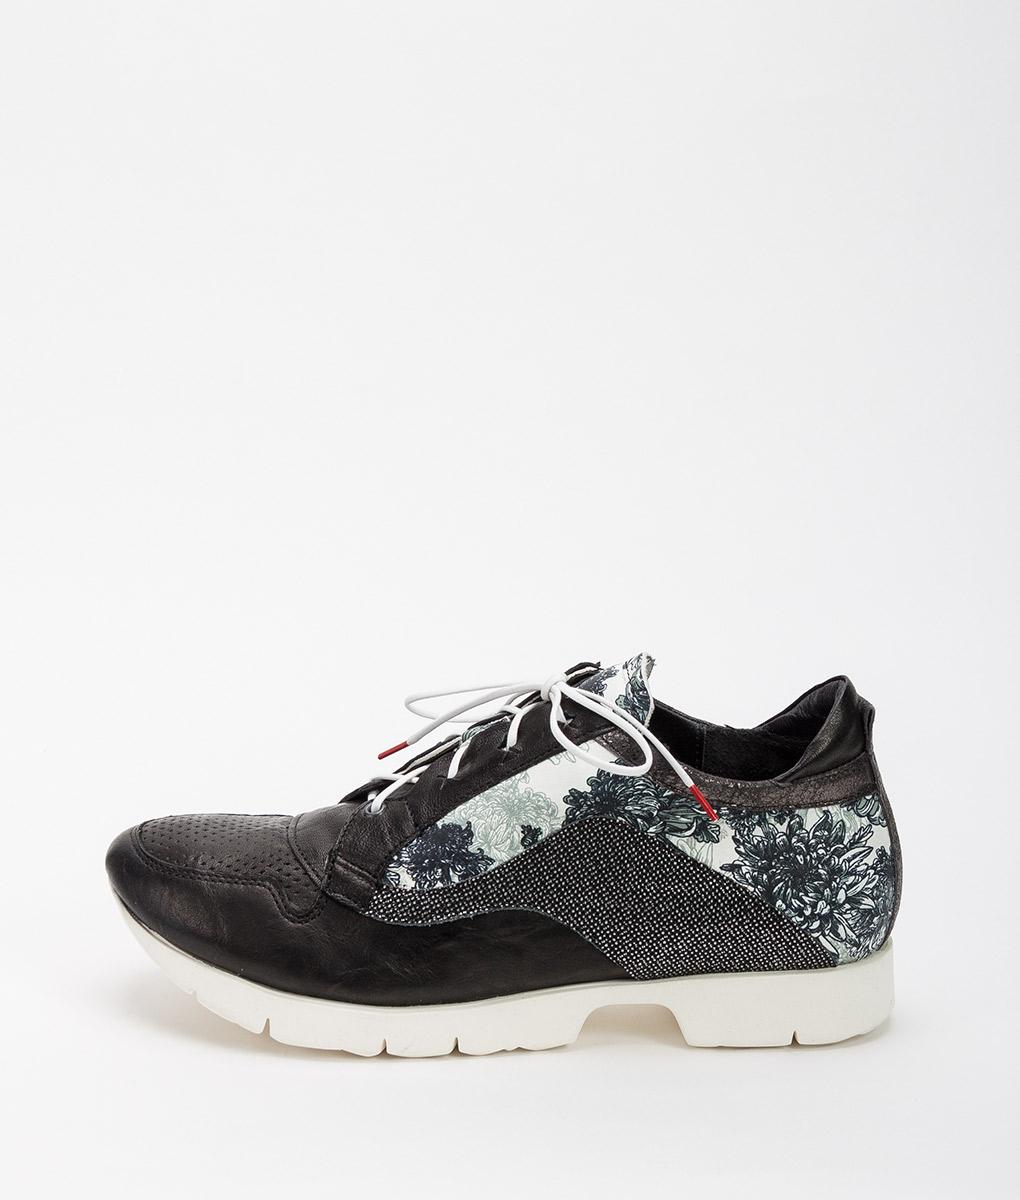 Women Sneakers RENNA SZ_White 199.99